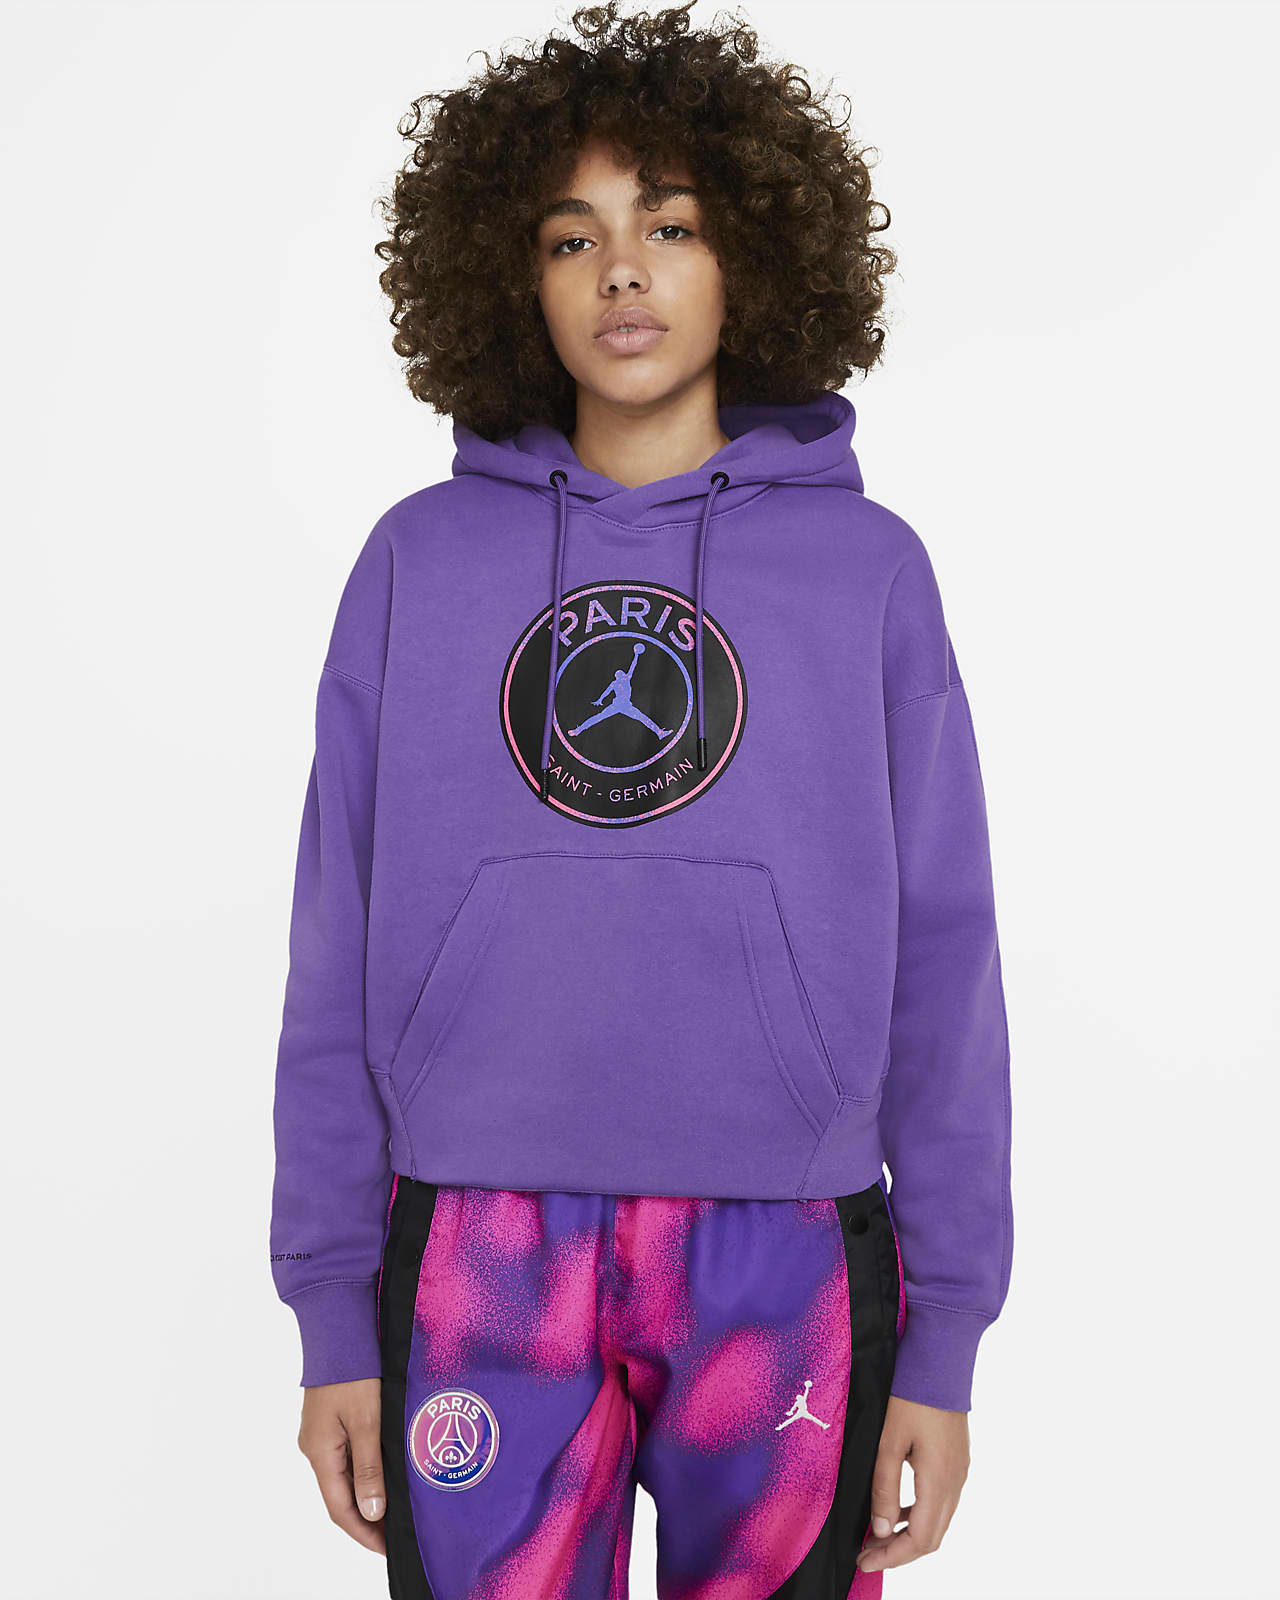 Paris Saint-Germain Women's Fleece Pullover Hoodie